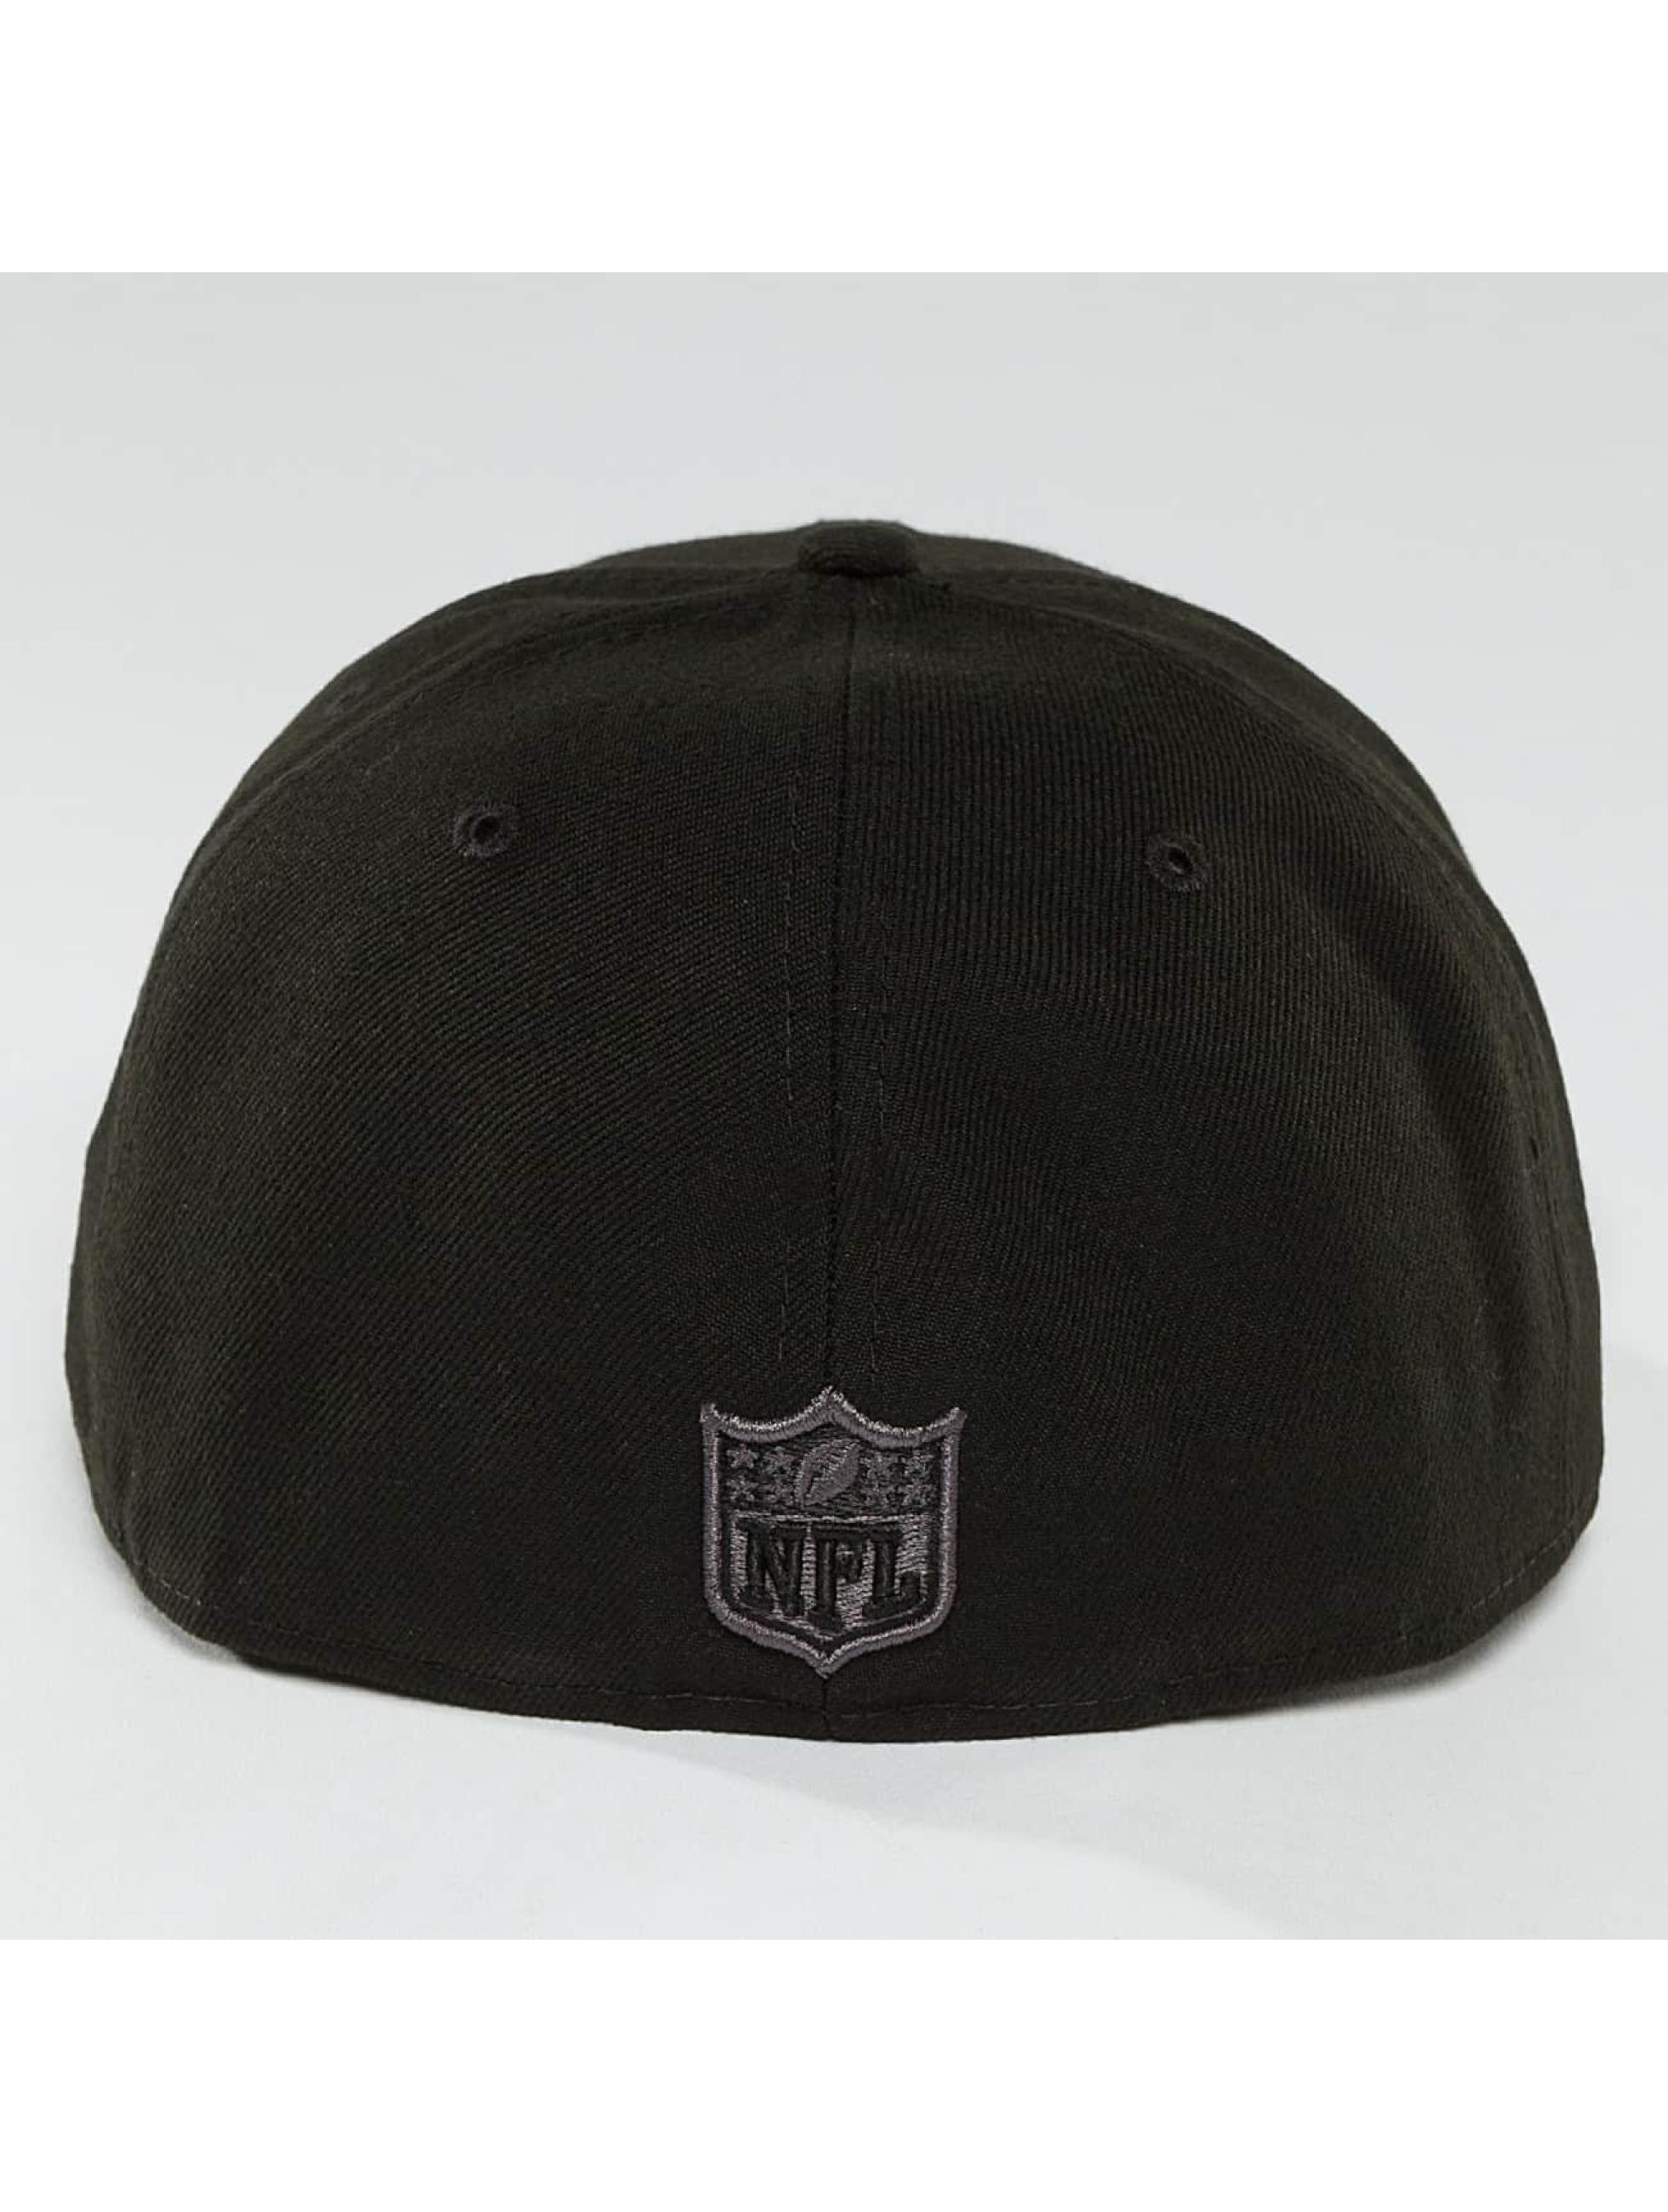 New Era Fitted Cap Black Graphite Oakland Raiders 59Fifty zwart